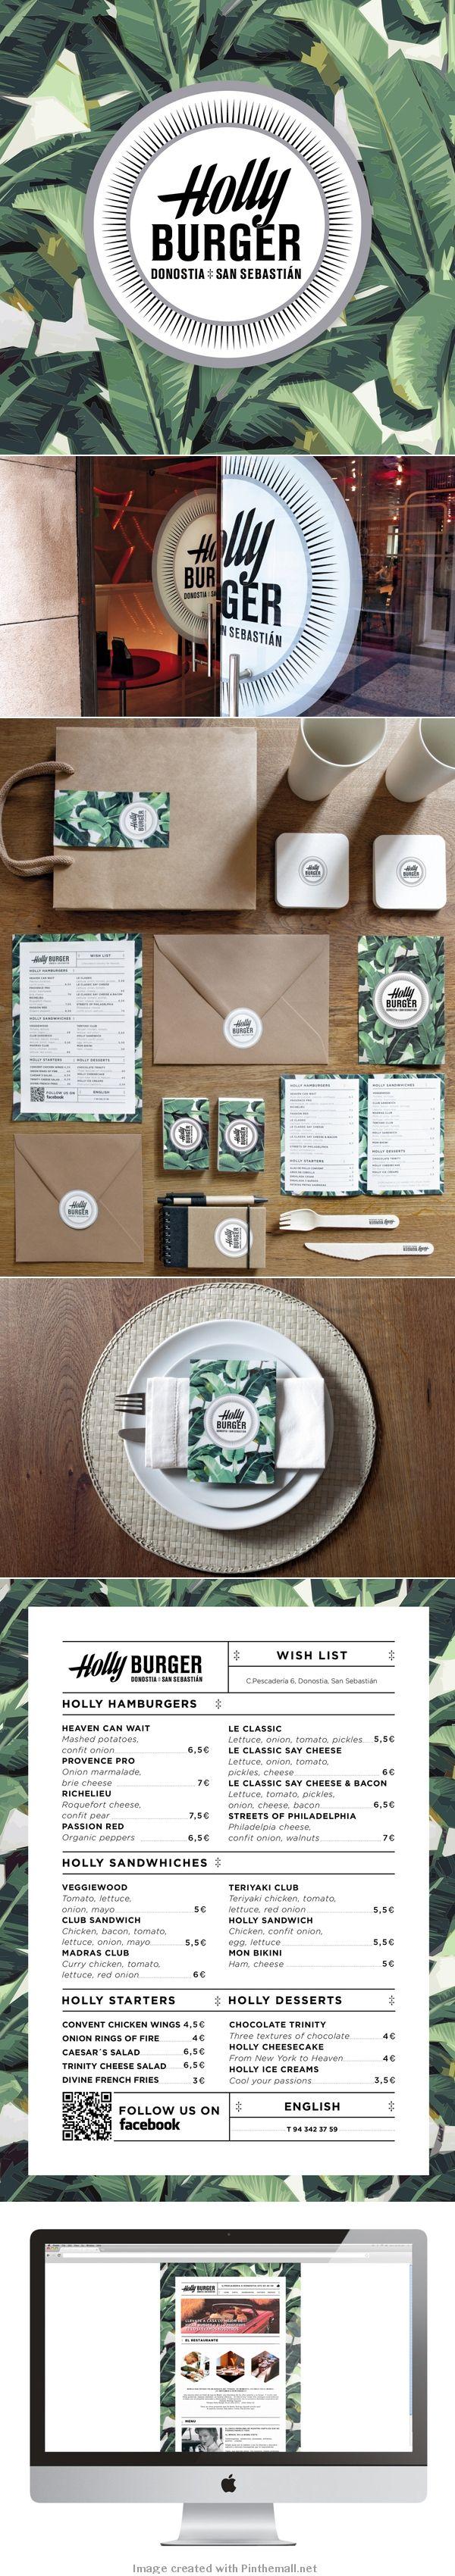 Brand Identity, Holly Burger #branding #brandidentity #design http://www.pinterest.com/designeurnet/